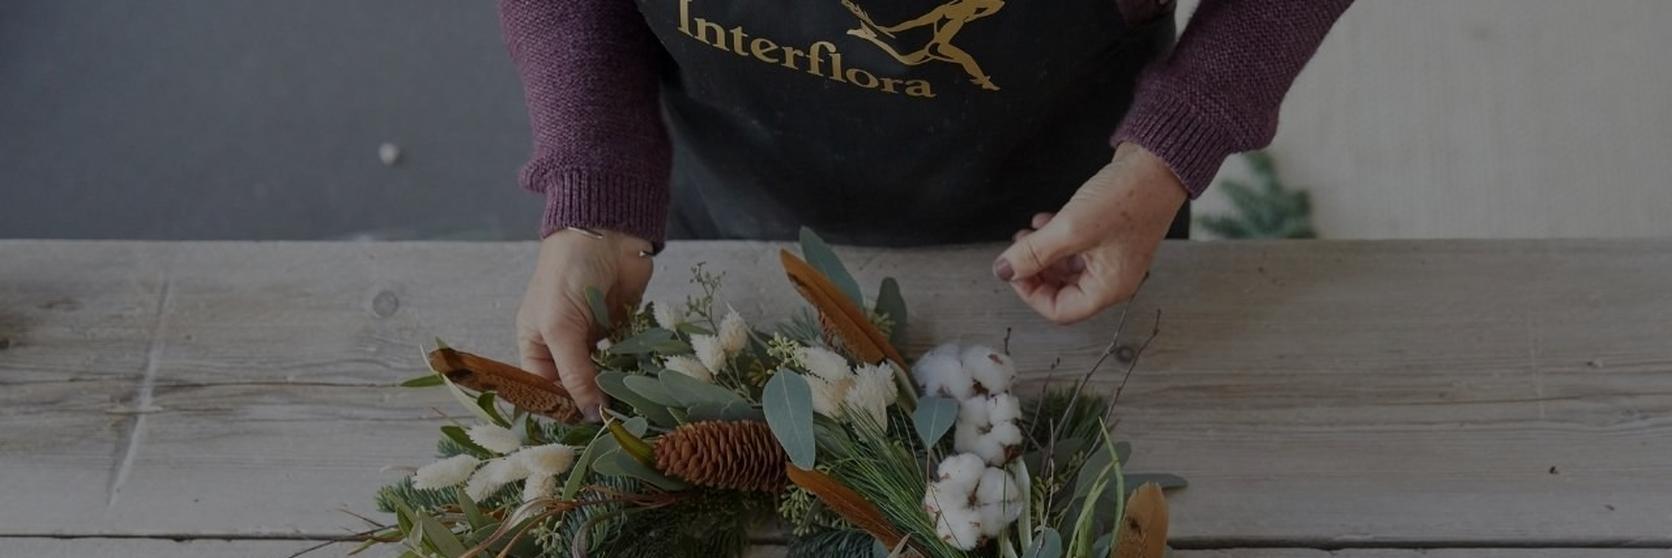 how_to_make_a_foilage_Christmas_wreath-10